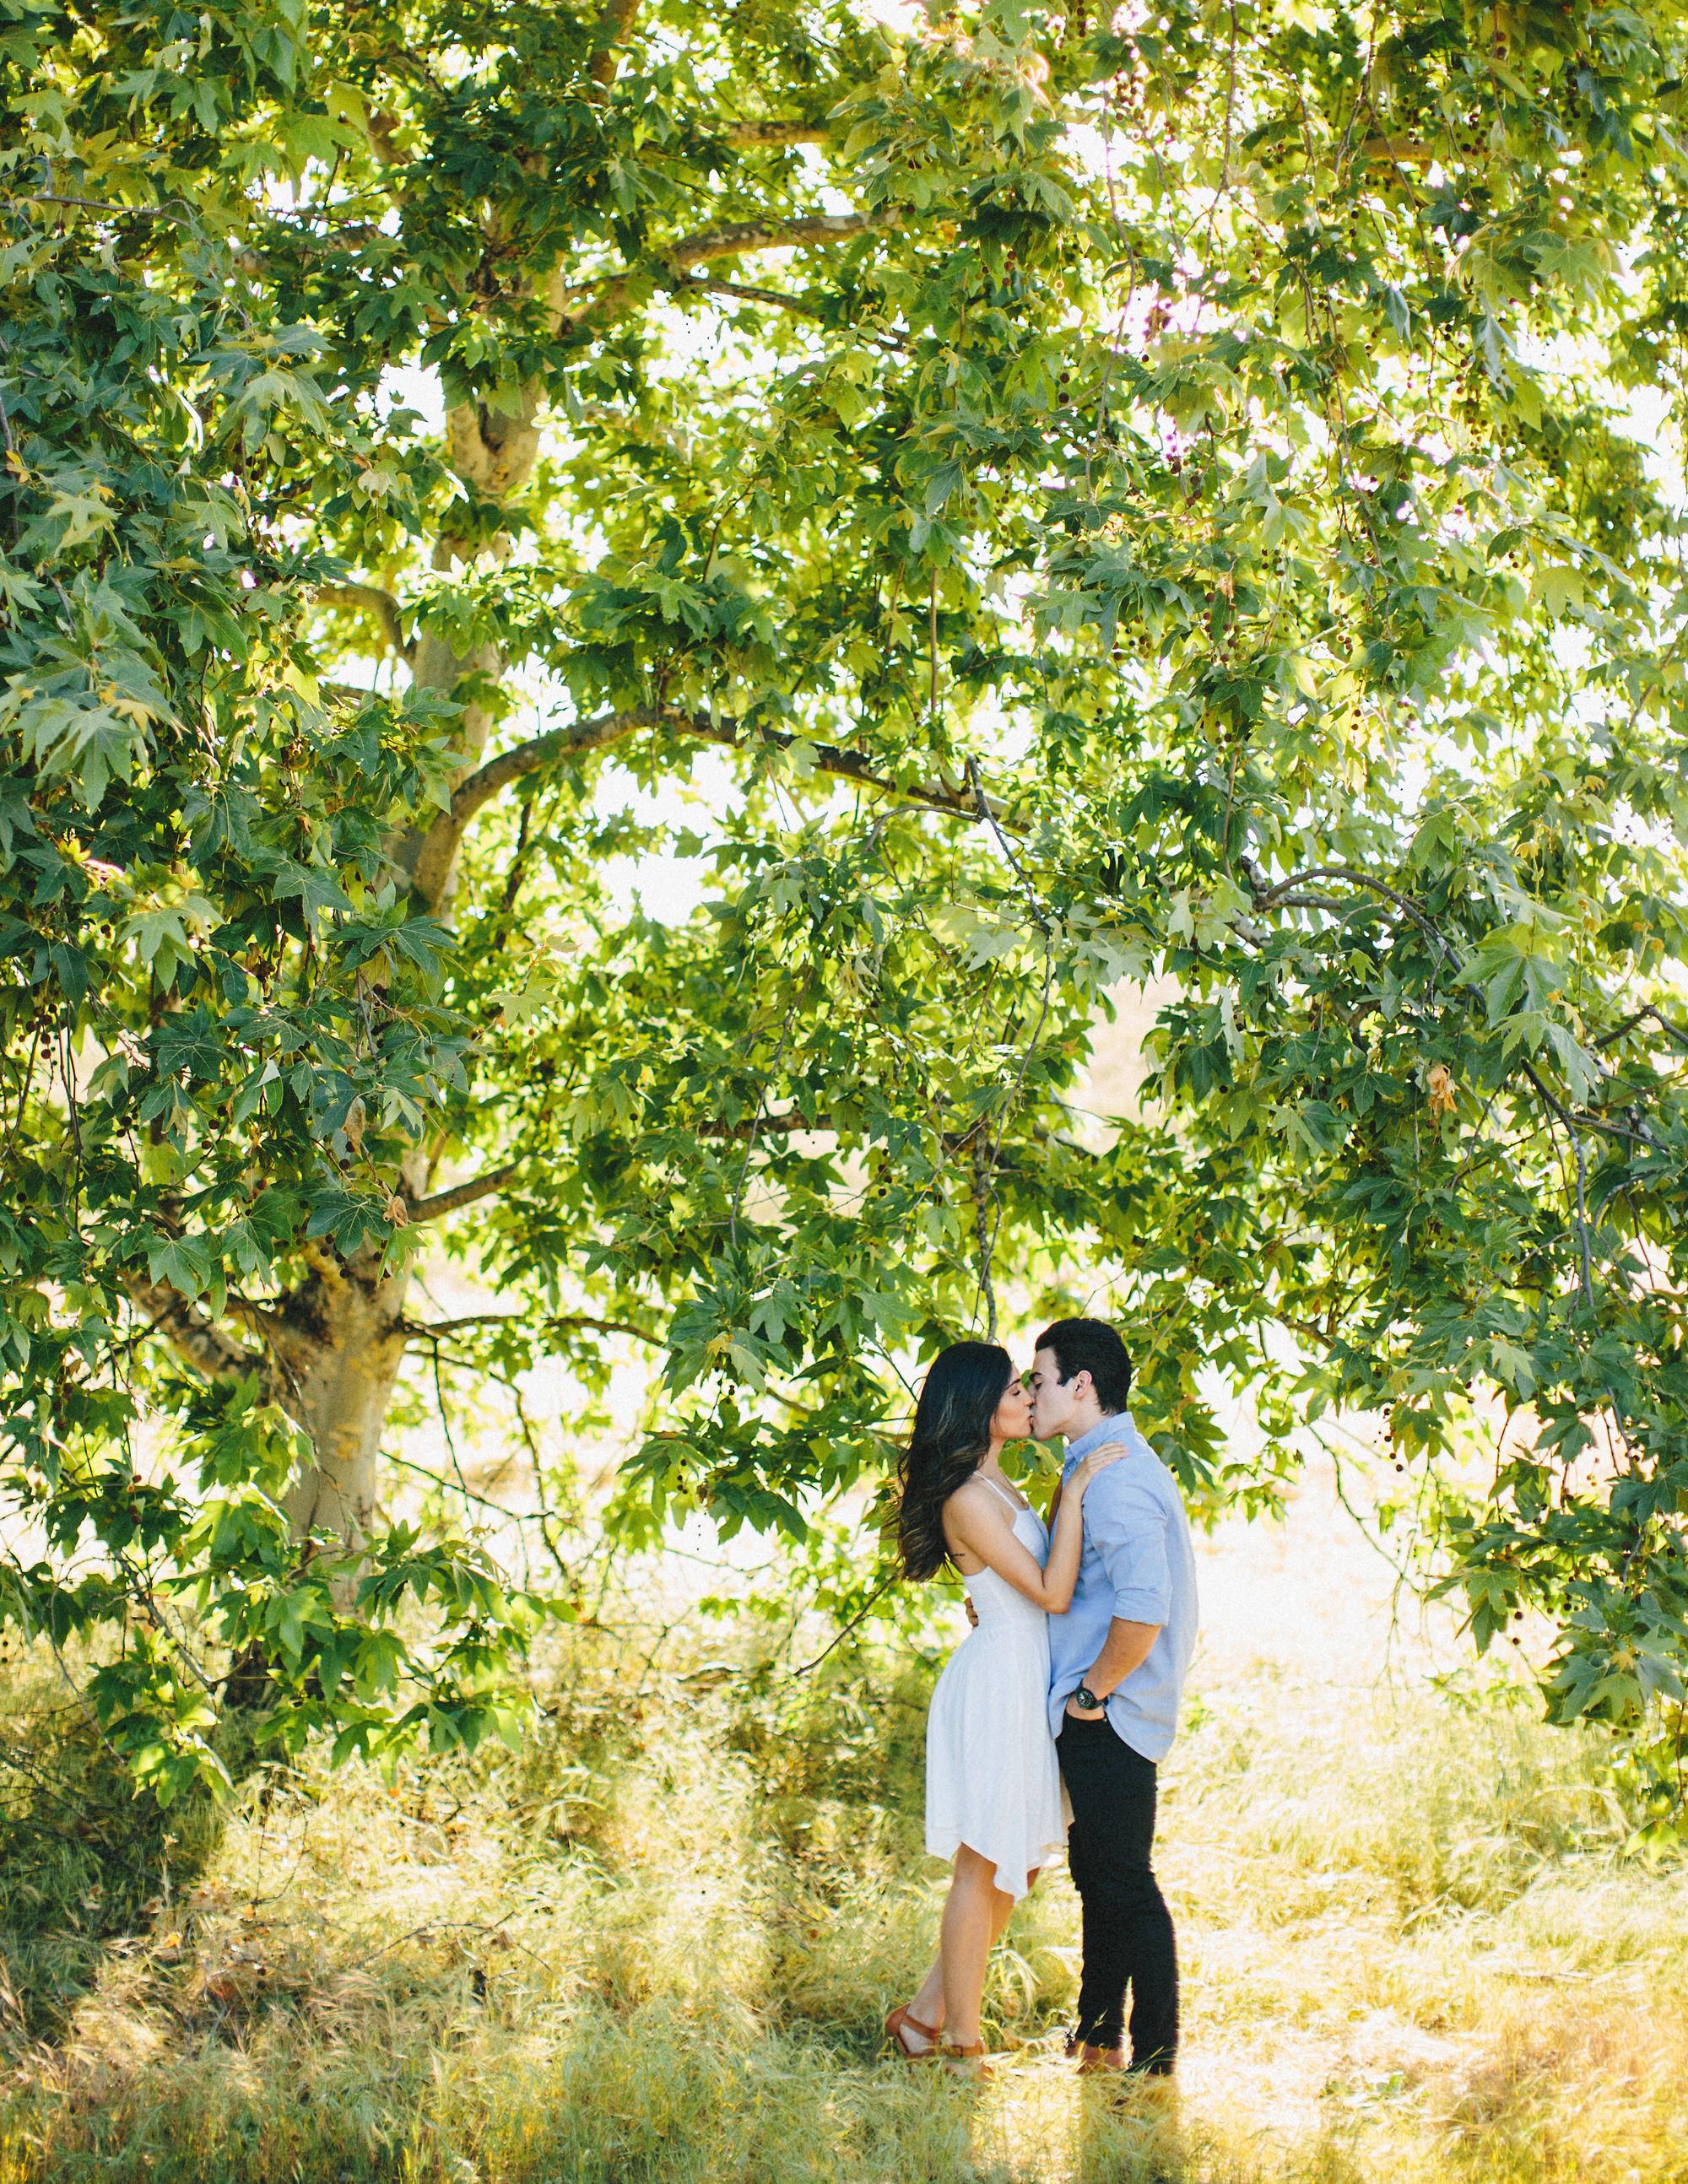 romantic-engagement-03.jpg